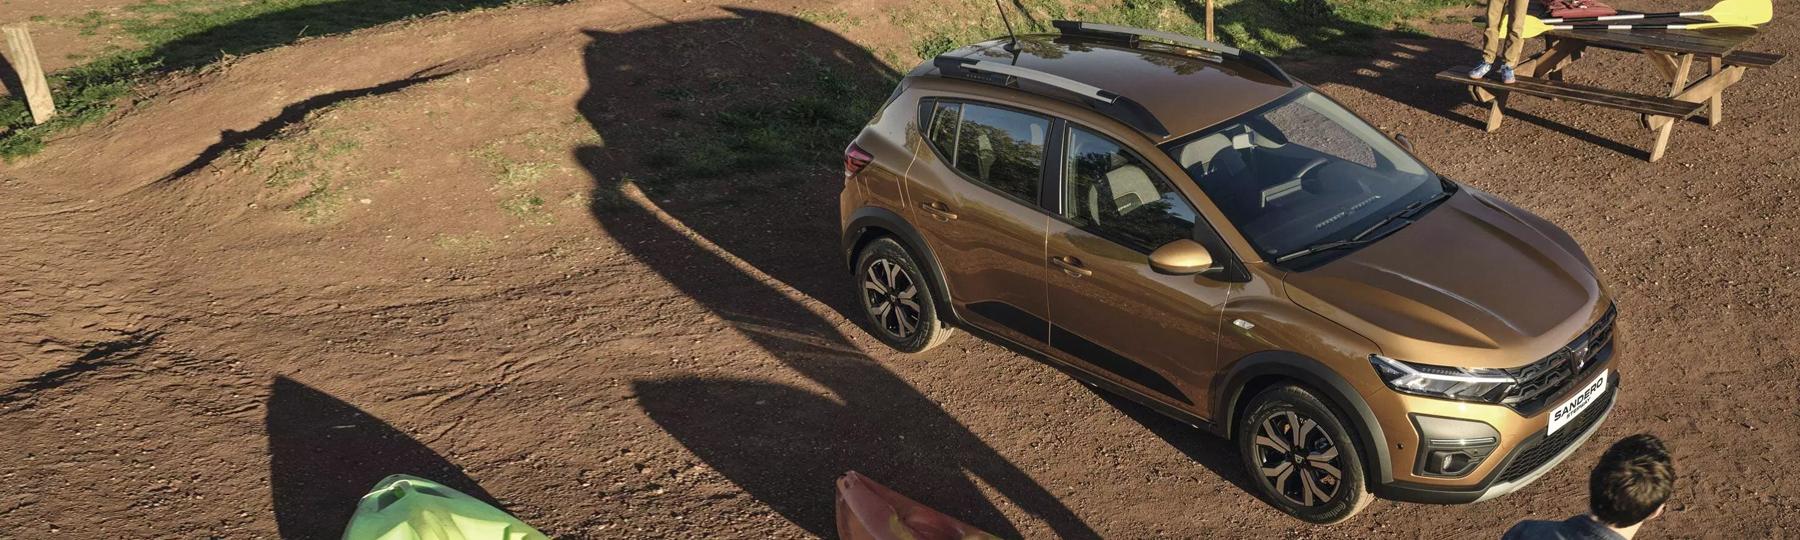 All-New Dacia Sandero Stepway New Car Offer